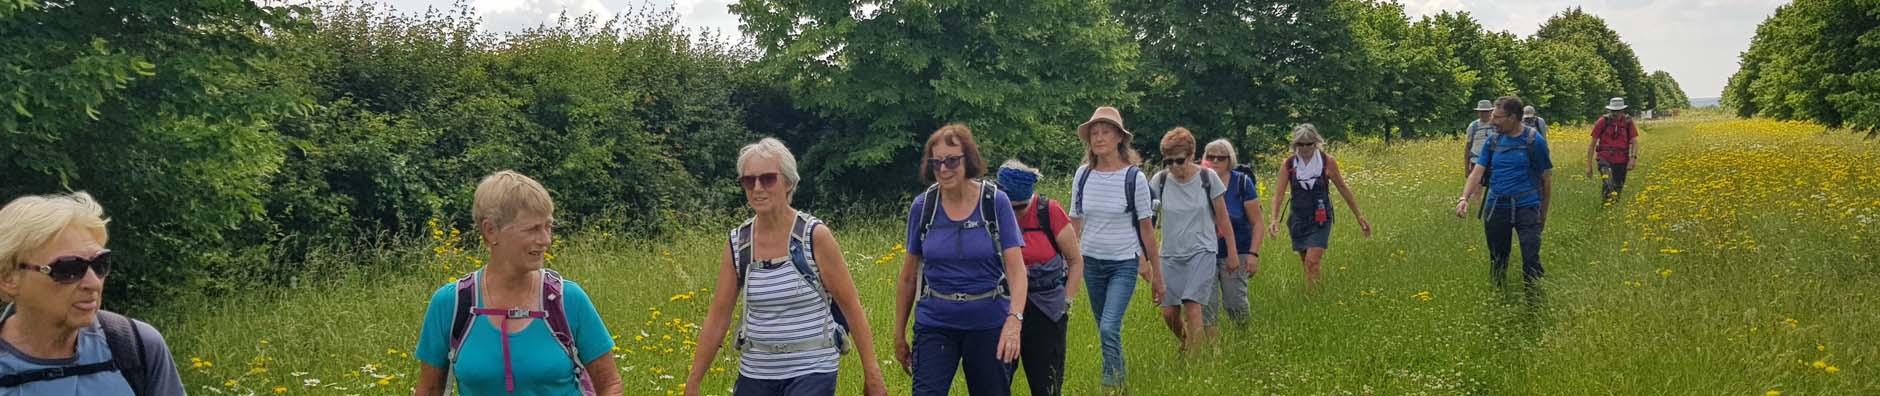 Wednesday Wimpole walk - June 2021